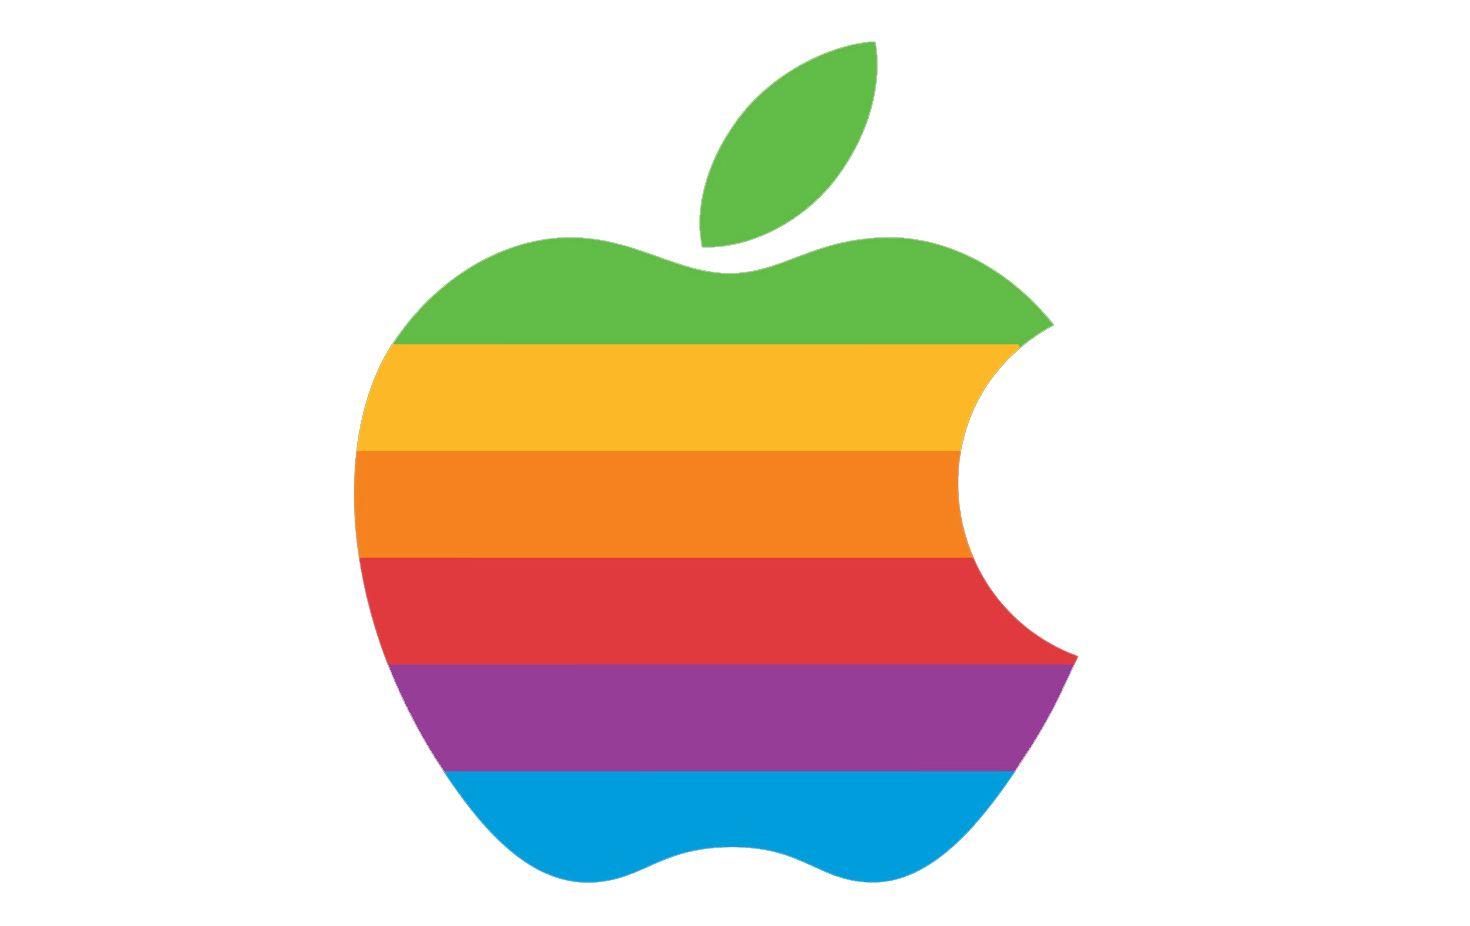 Old iPhone logo 애플로고, 애플 바탕화면, 로고